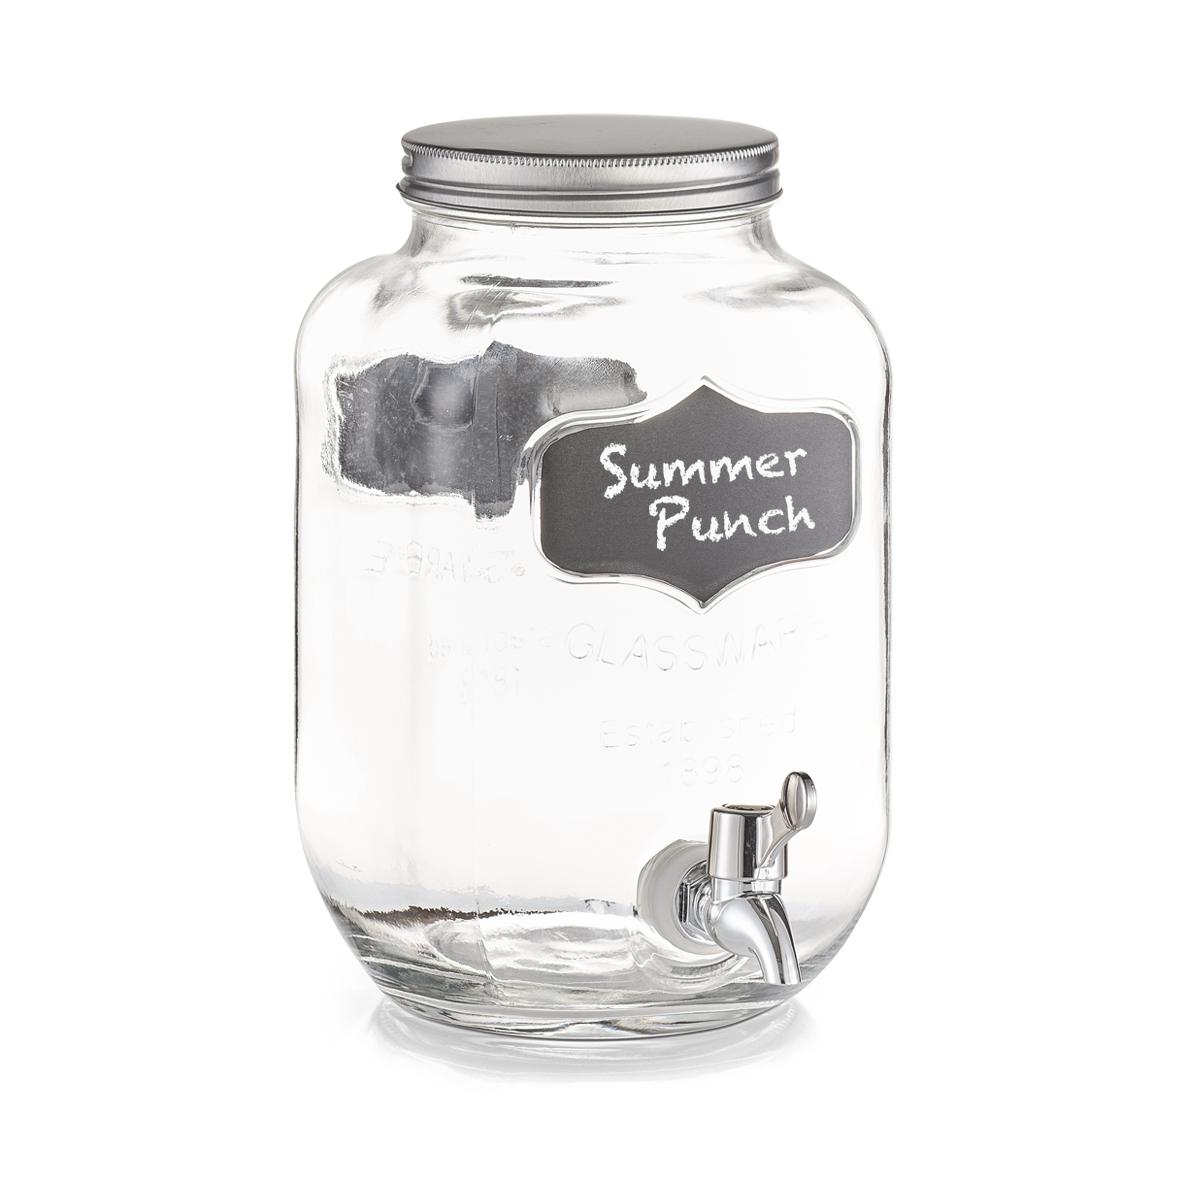 Dispenser pentru bauturi Summer Punch, 3,8 L, L15,5xl15,5xH25,5 cm somproduct.ro